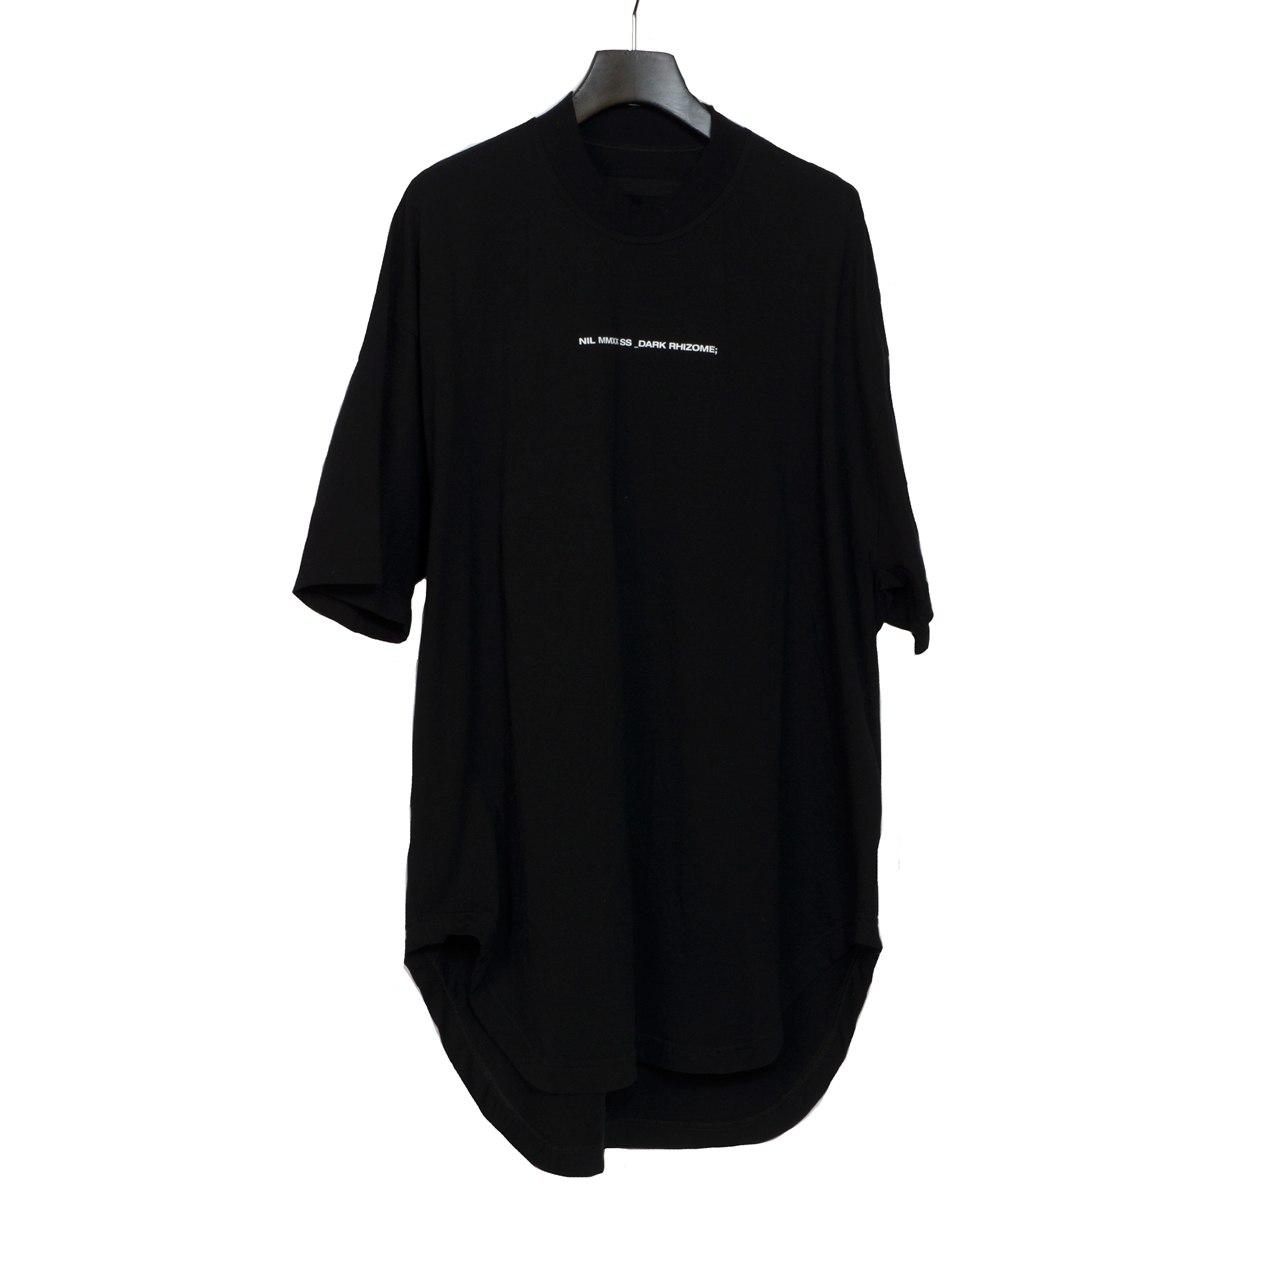 700CPM1-BLACK / J.D. バックプリントラウンド T シャツ